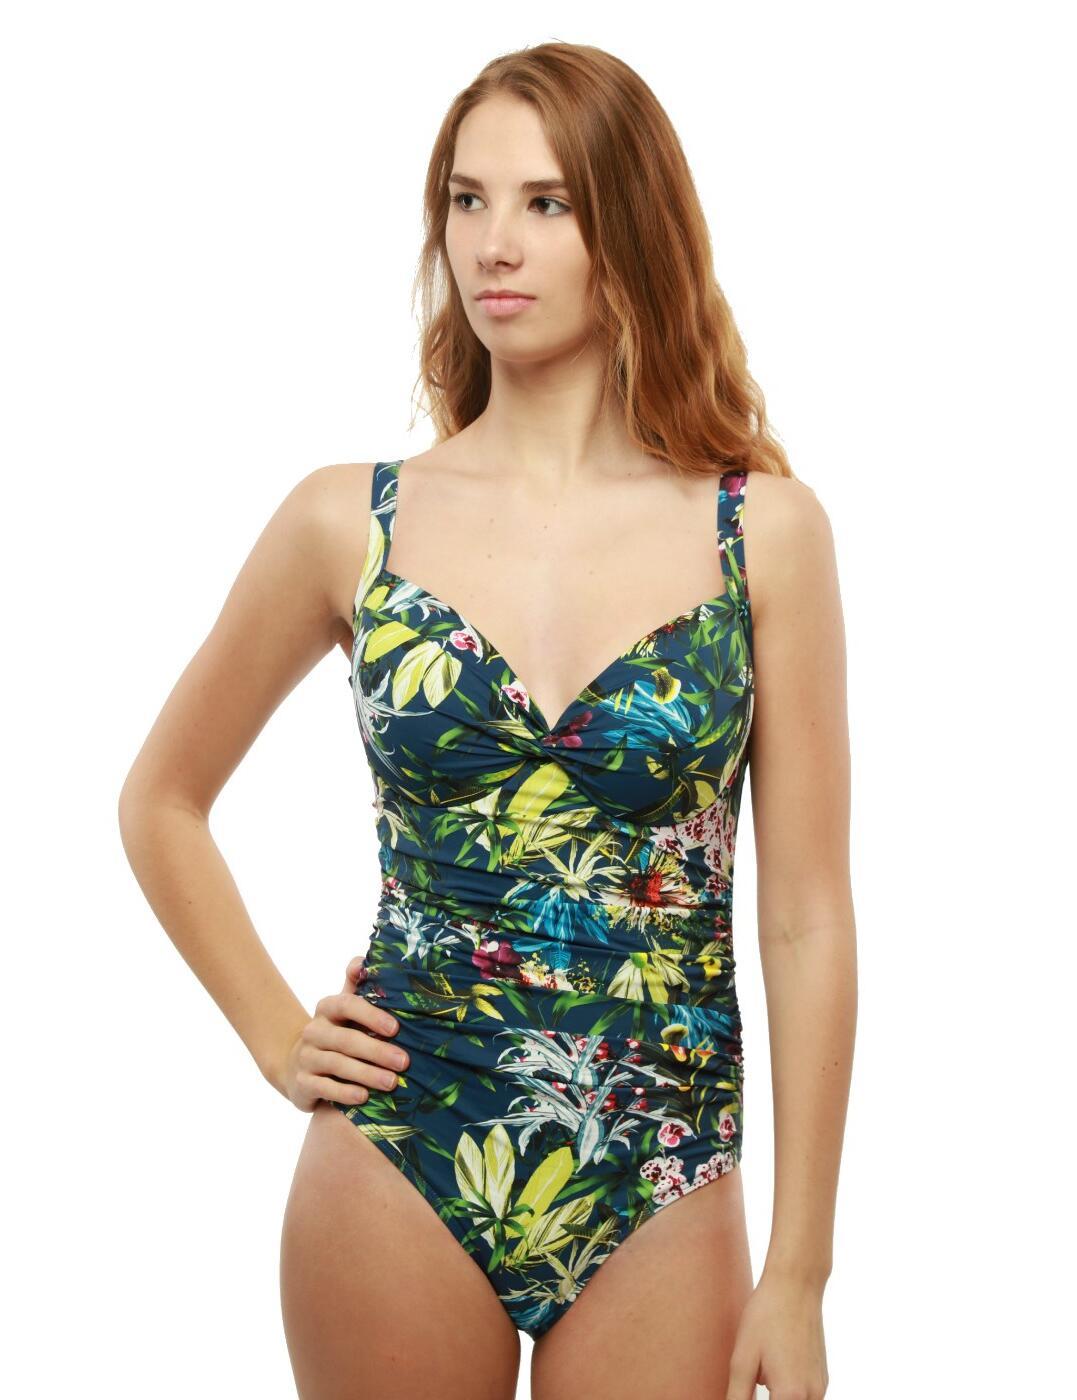 M445BT Moontide Botanical Twist Underwired Cross Front Swimsuit - M4458BT Jeans